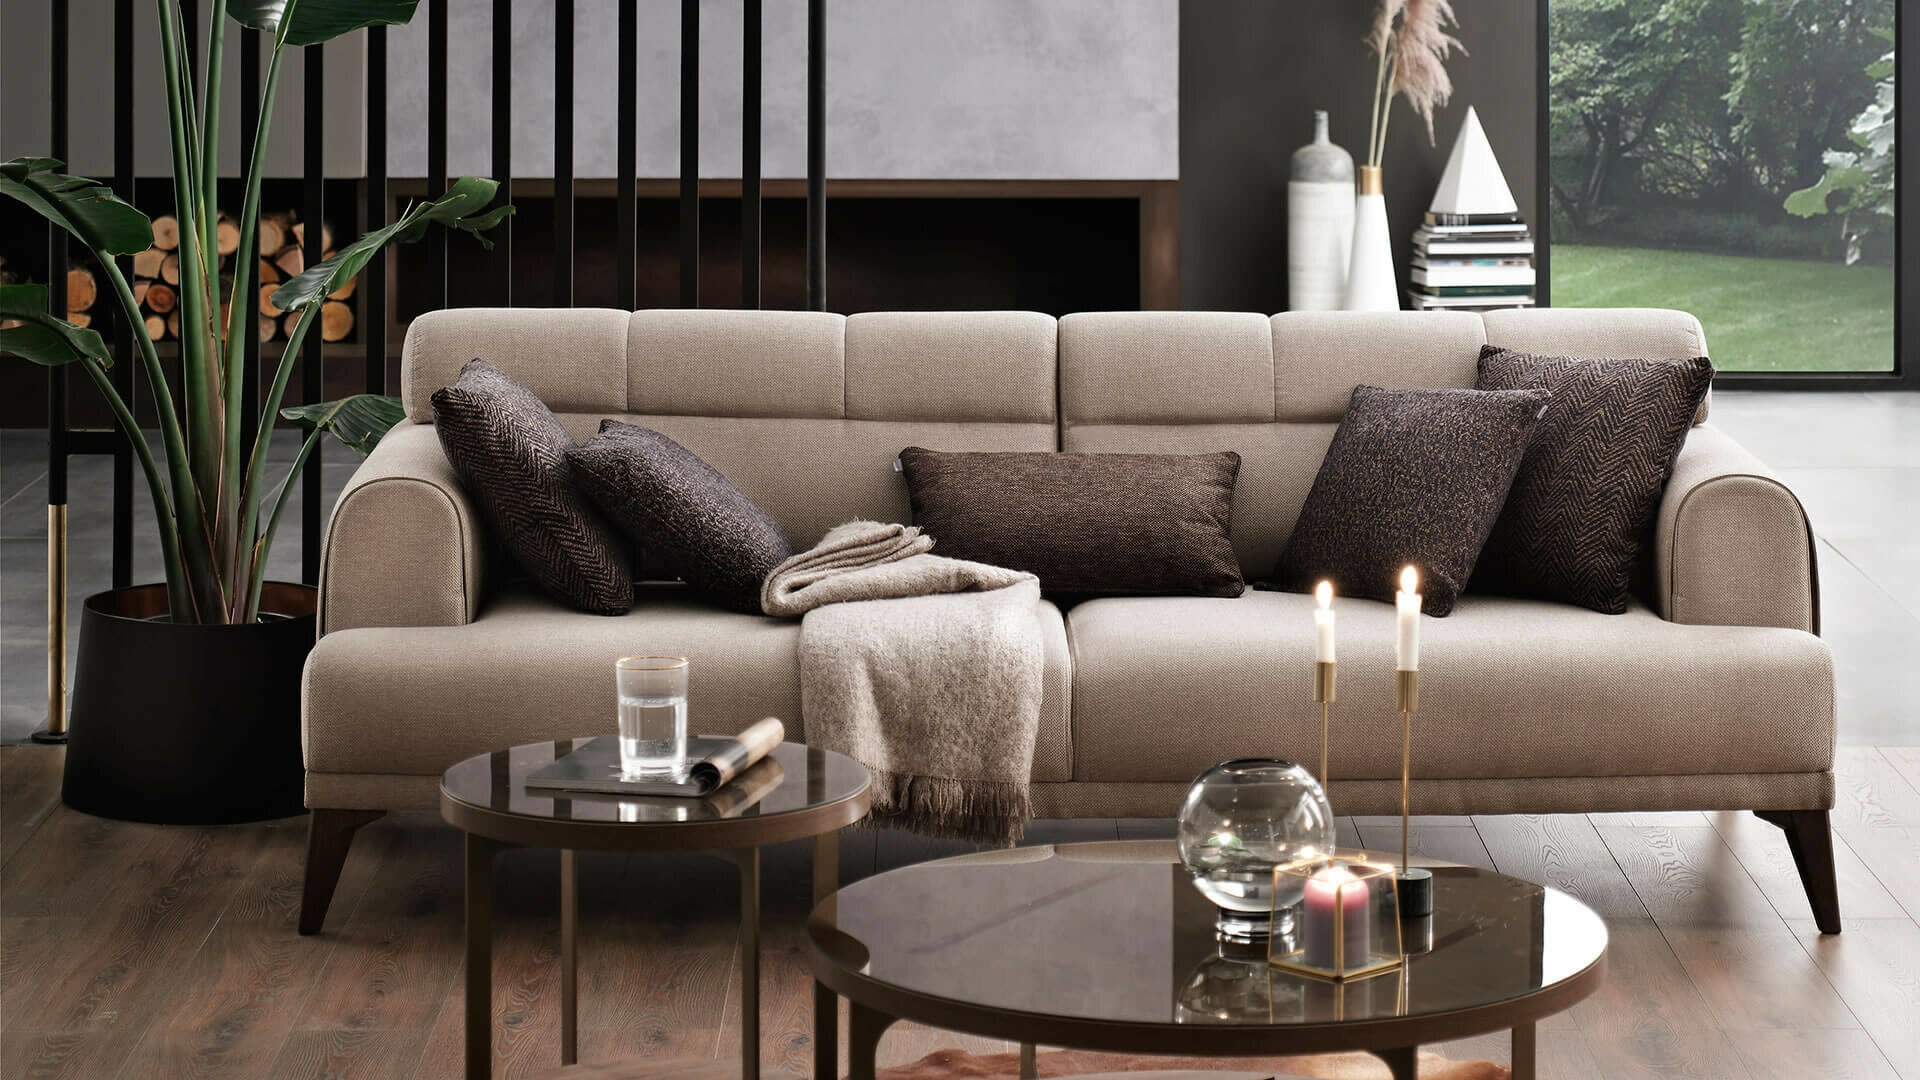 Canapea fixa cu mecanism Relax, tapitata cu stofa 3 locuri Madrid Bej, l231xA102xH80 cm imagine 2021